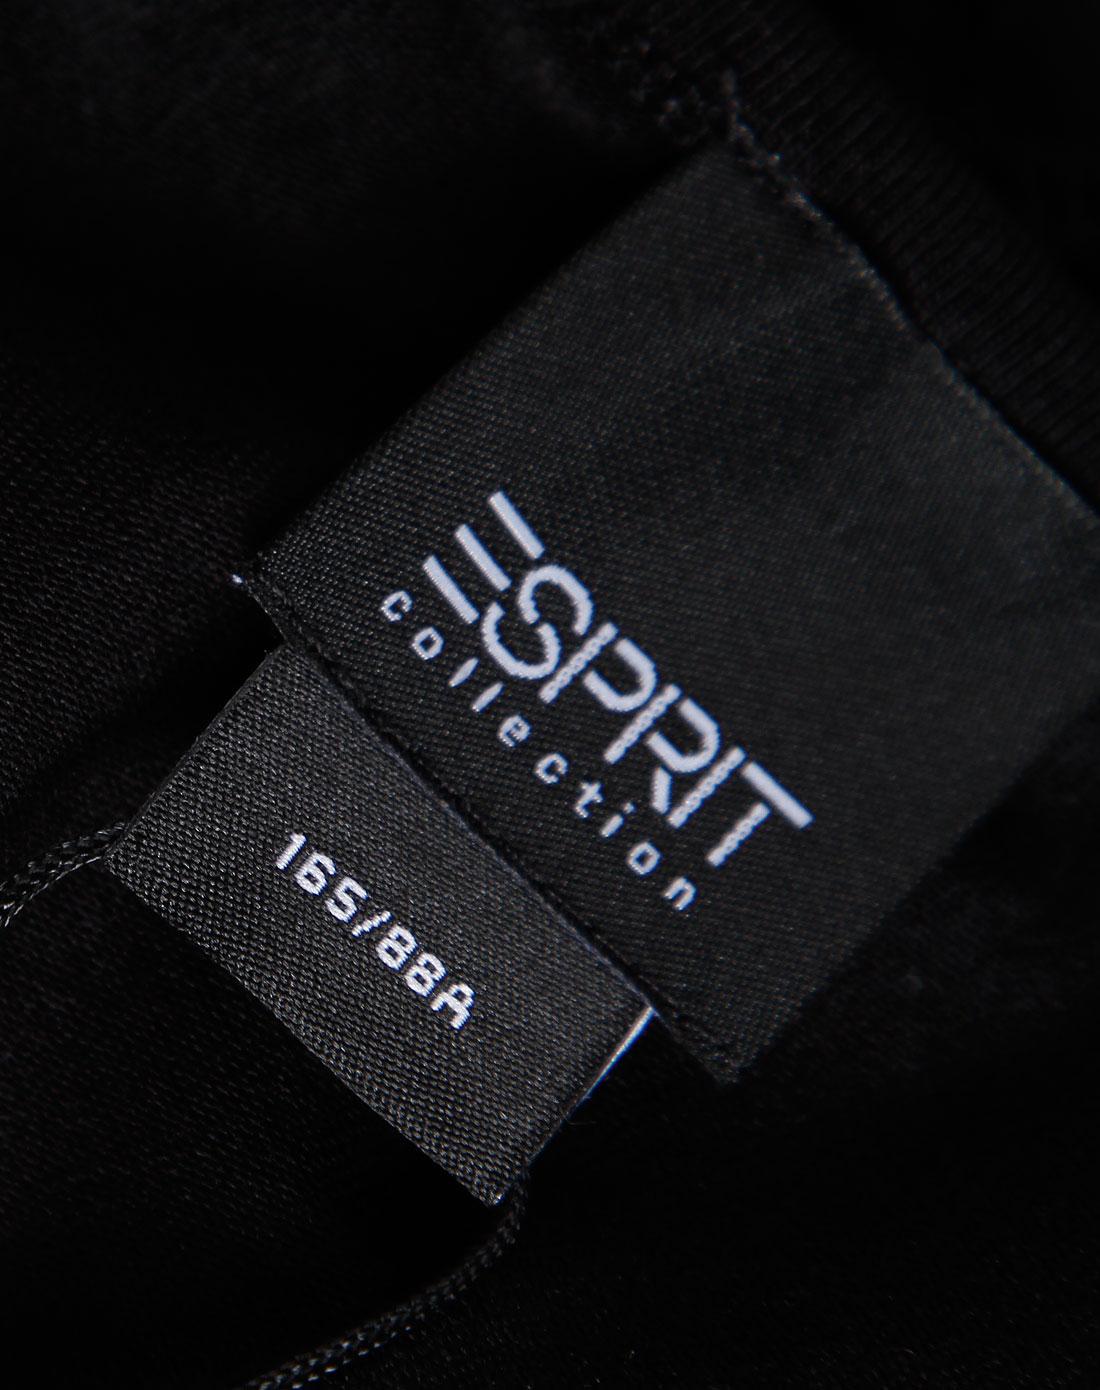 Esprit 女款黑色蕾丝边吊带衫 埃斯普利特Esprit官网特价2.5图片